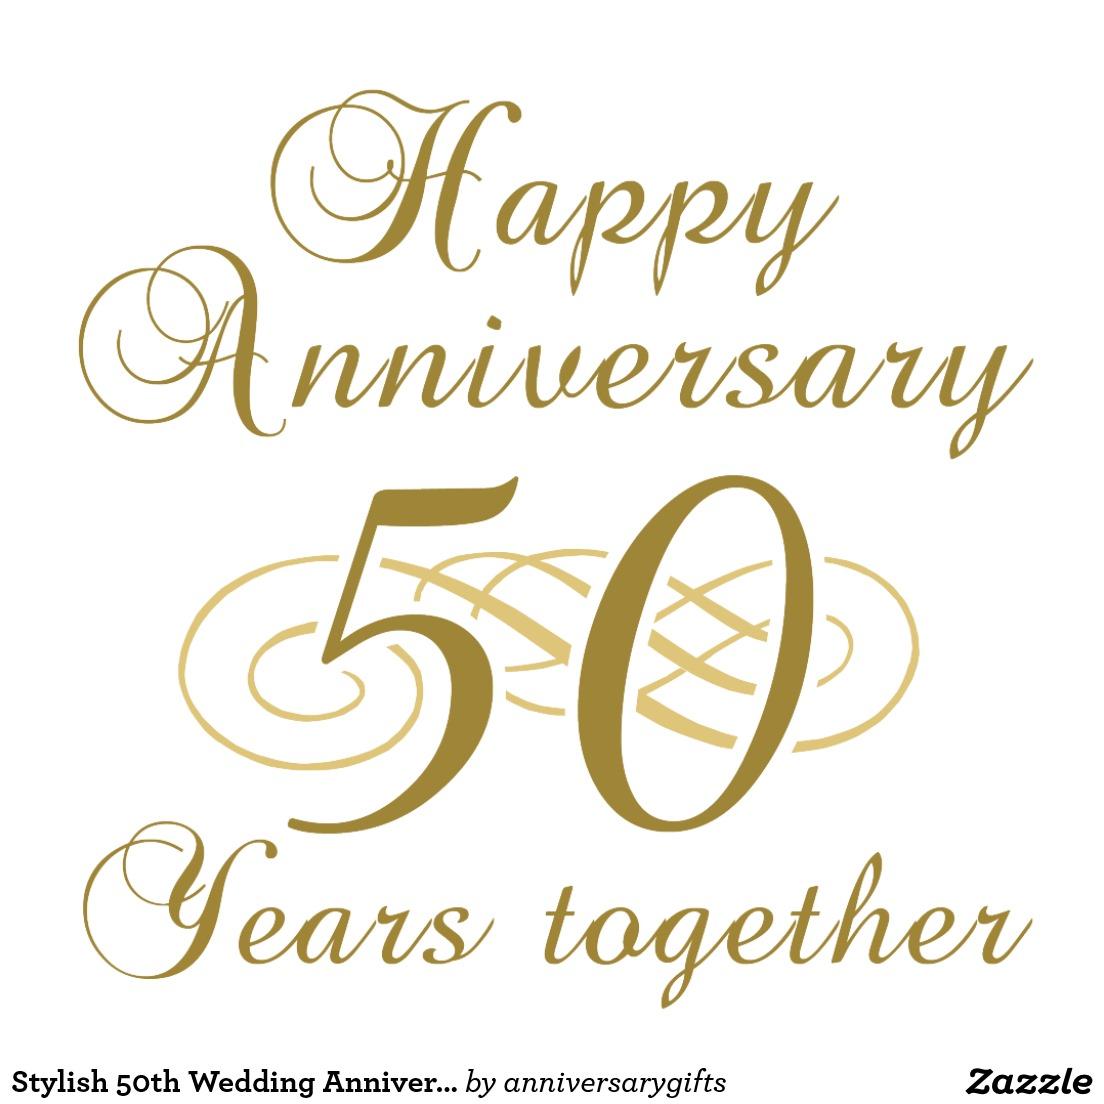 Hillbilly wedding clipart clipart library download Free wedding anniversary clipart 1 » Clipart Station clipart library download